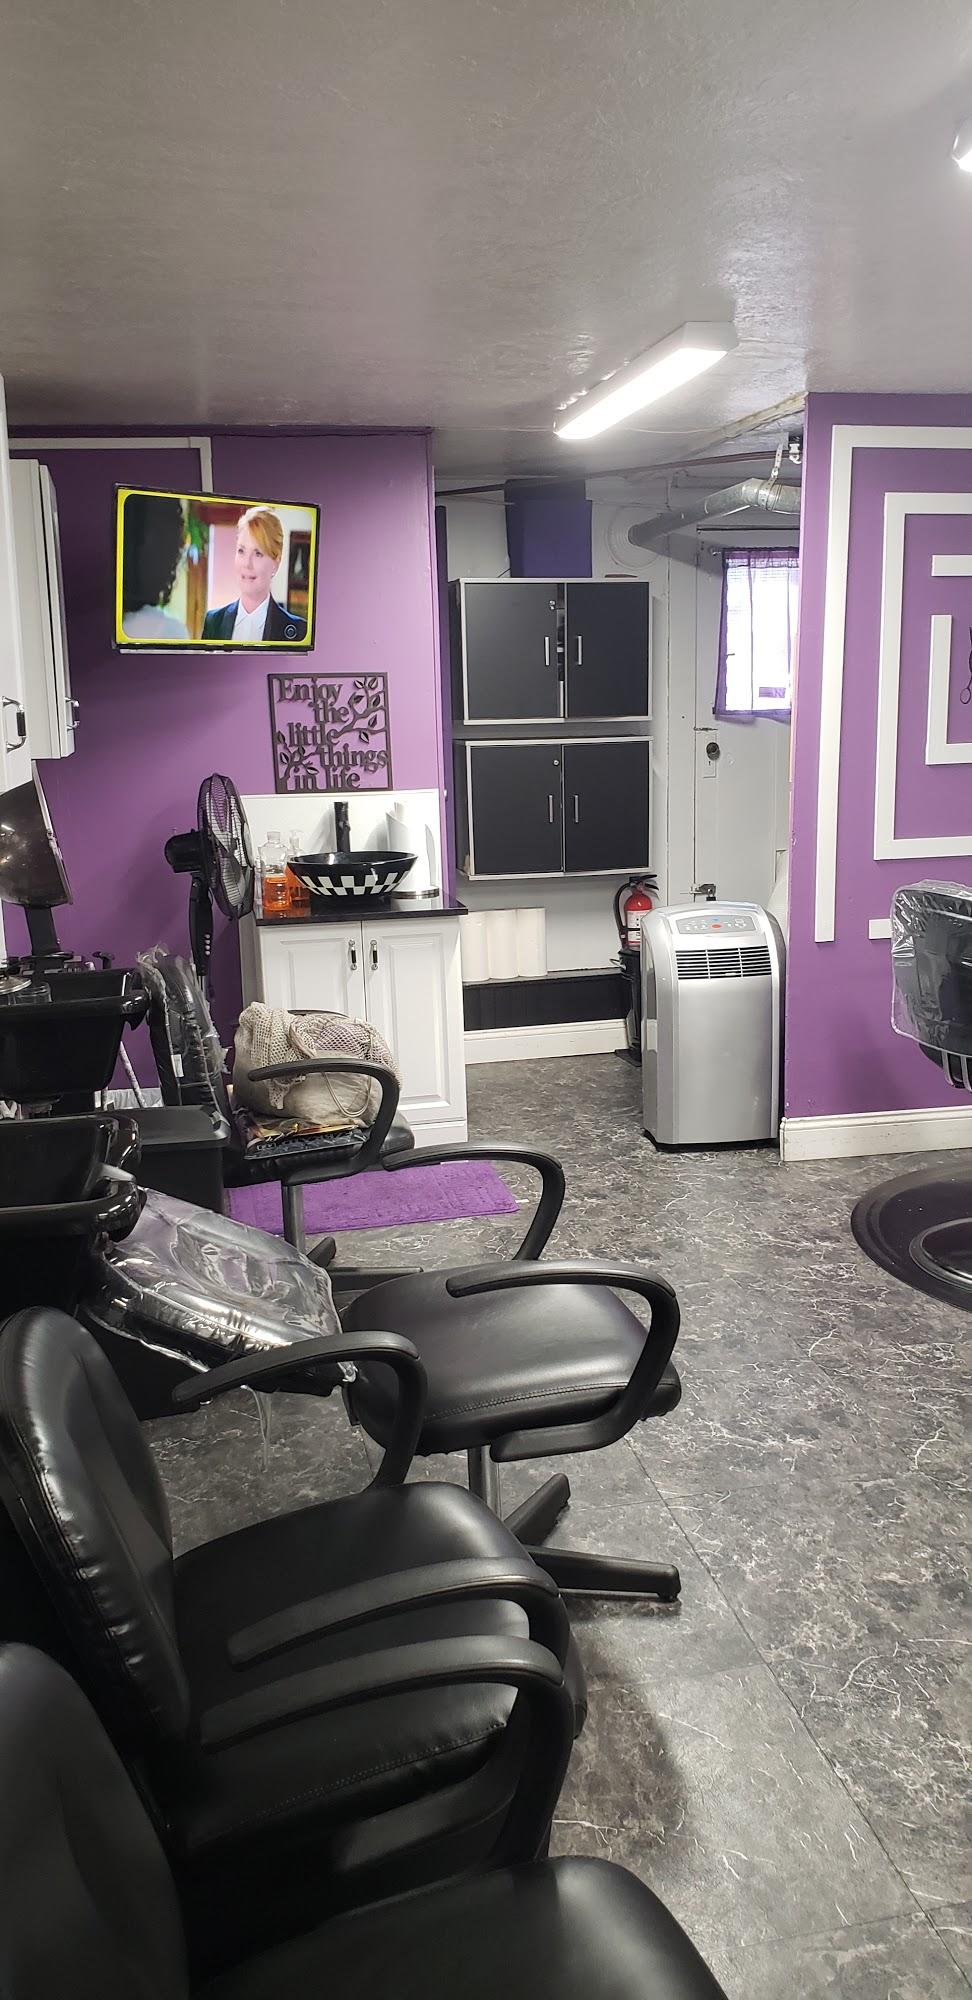 Tammed Mane Beauty Salon 833 40th St, Oakland